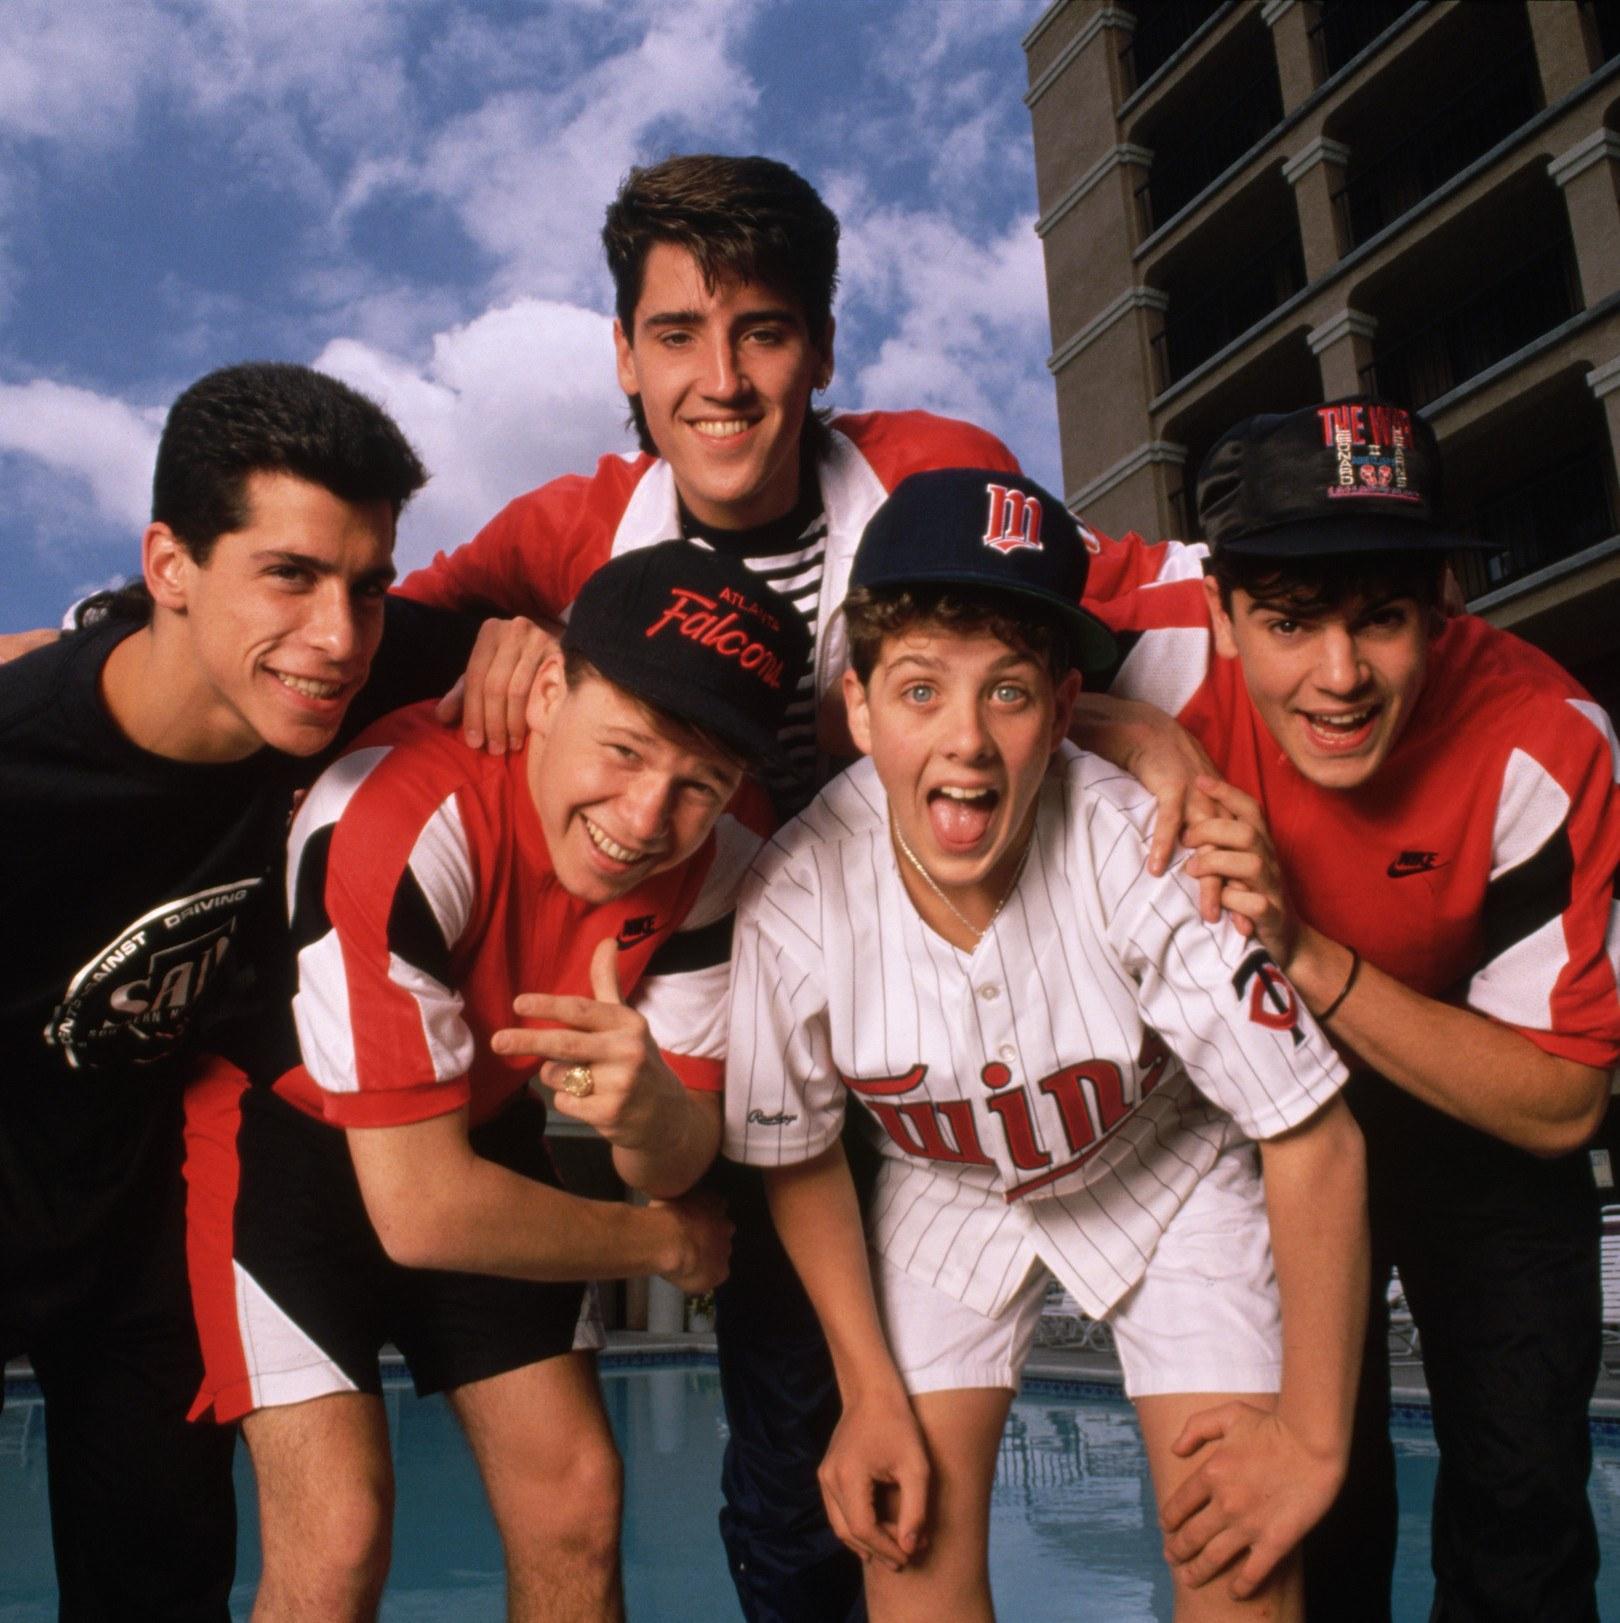 Jonathan Knight, Jordan Knight, Joey McIntyre, Donnie Wahlberg, Danny Wood, New Kids on the Block 1989